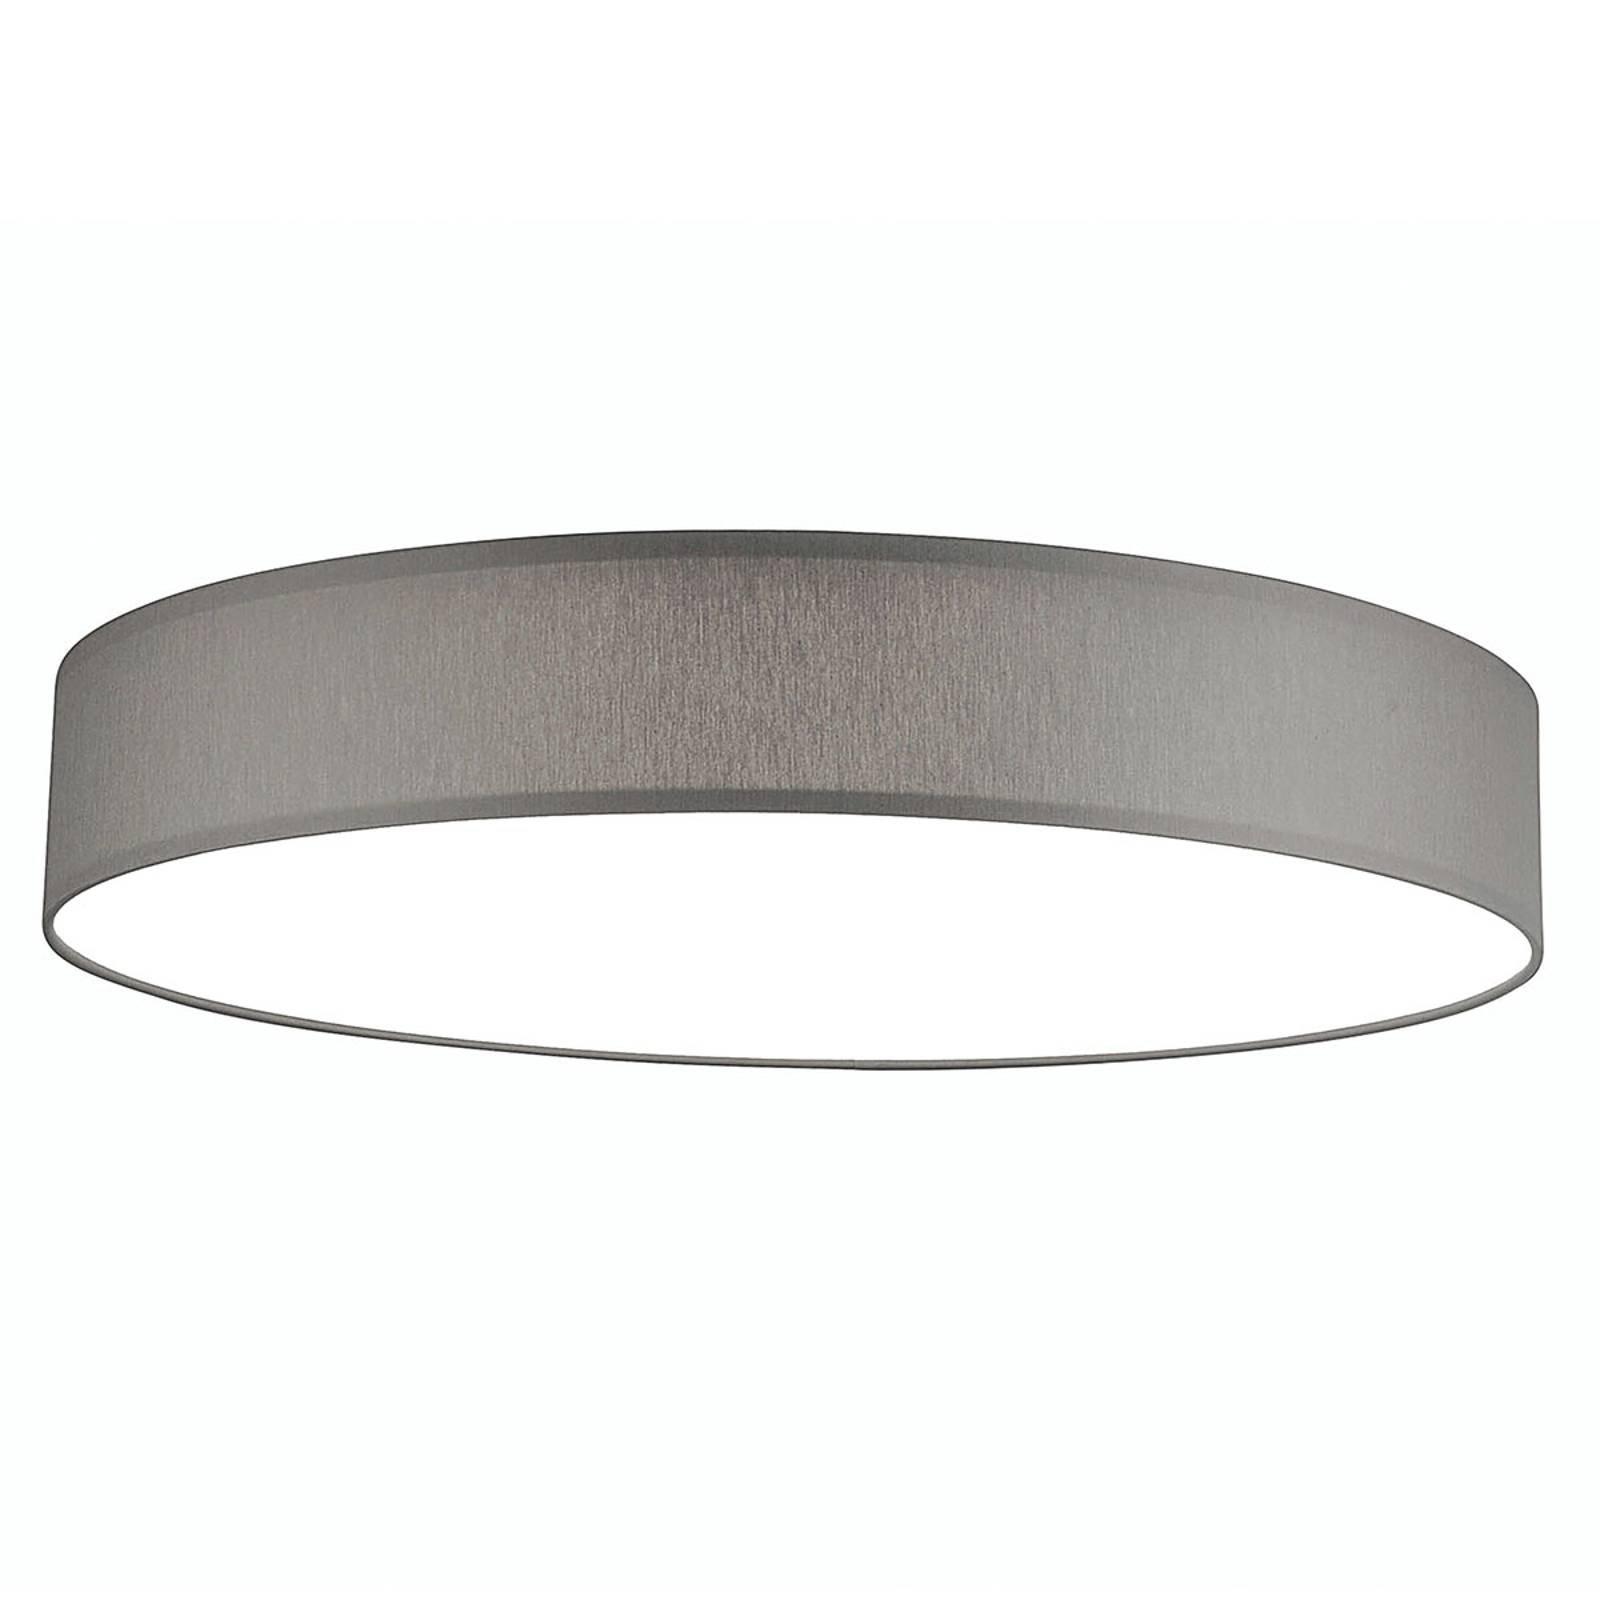 LED-taklampe Luno XL, 3 000 K, 100 W, lysegrå